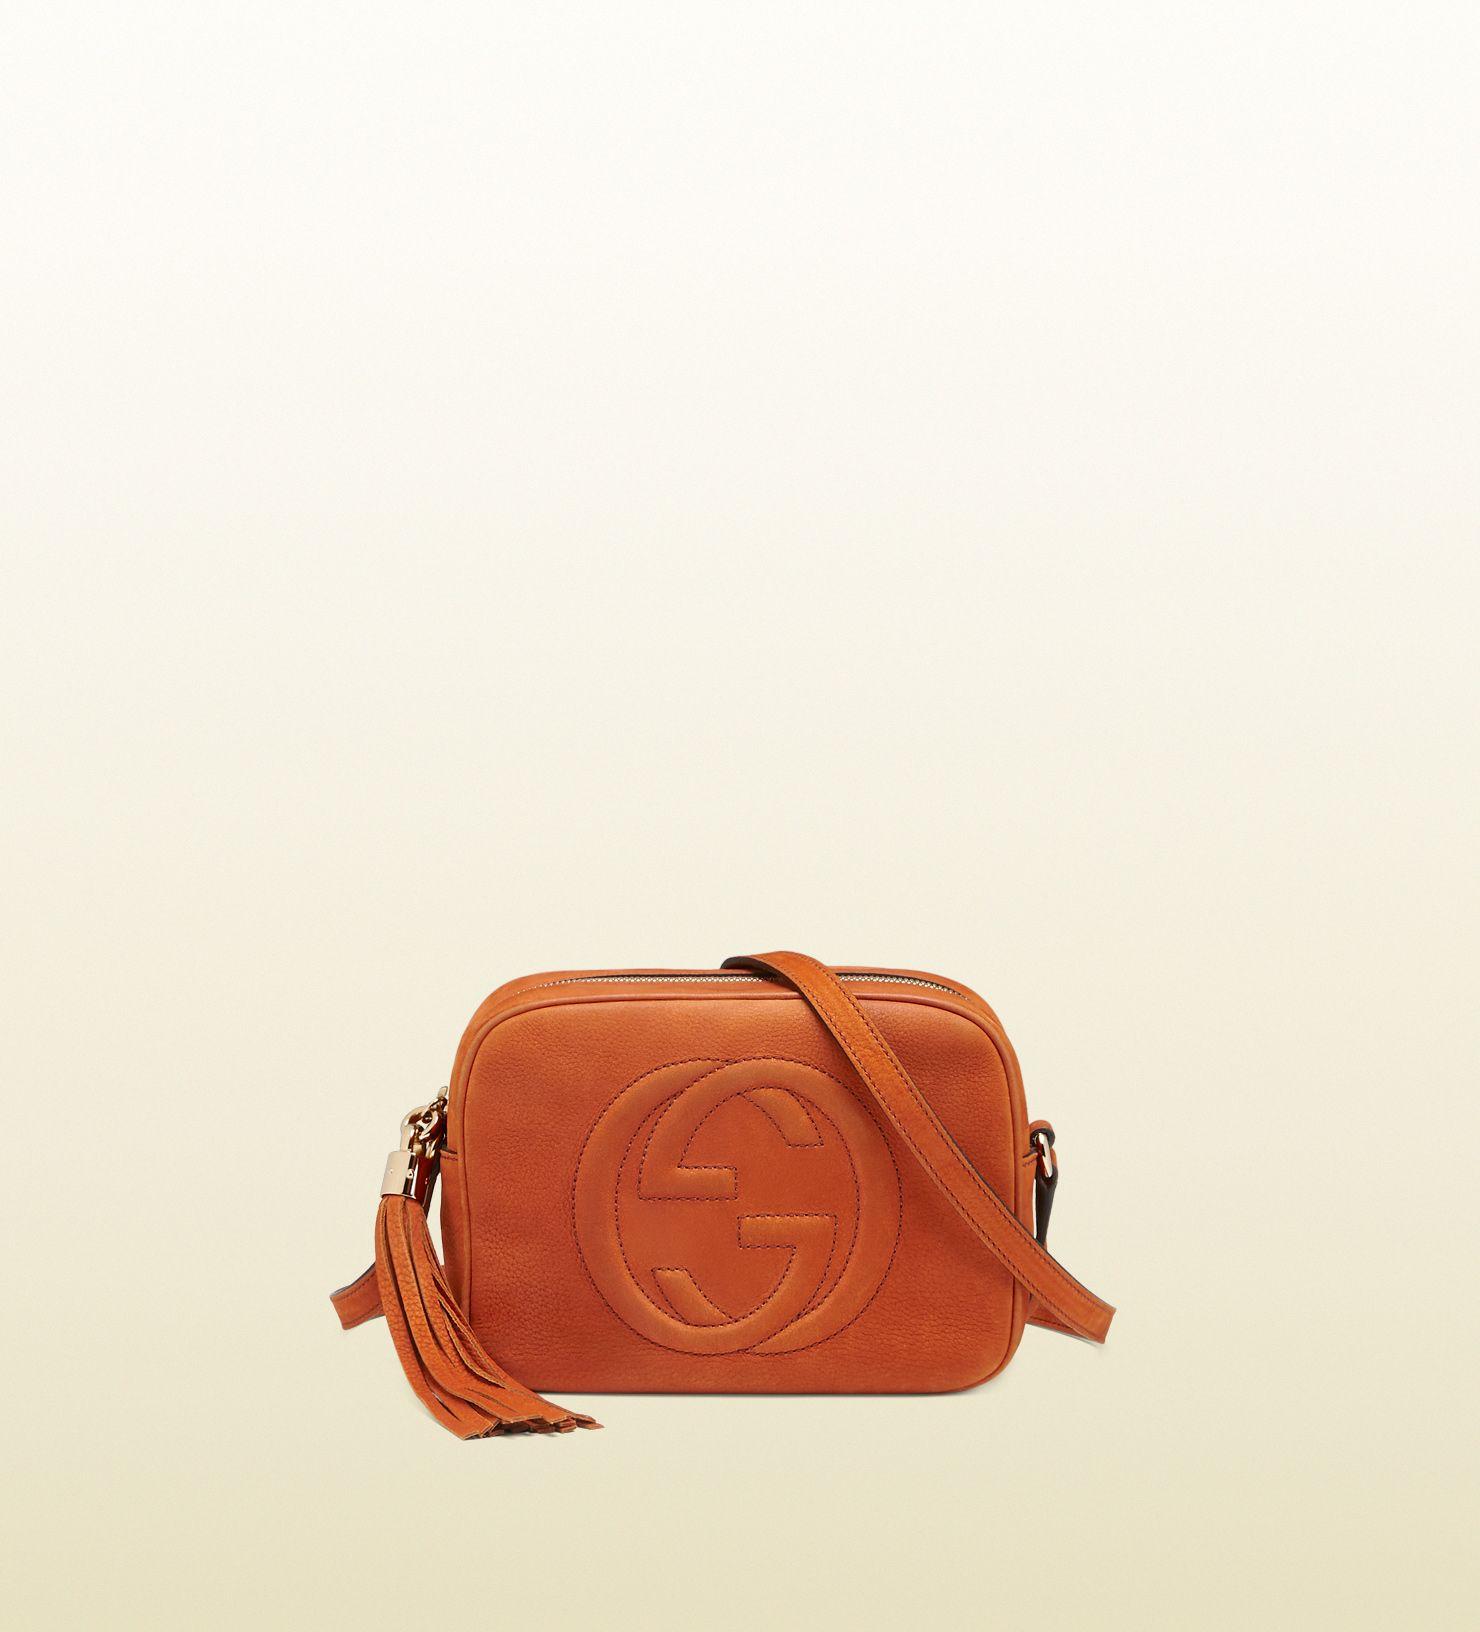 64ec23e2f22 soho nubuck leather disco bag